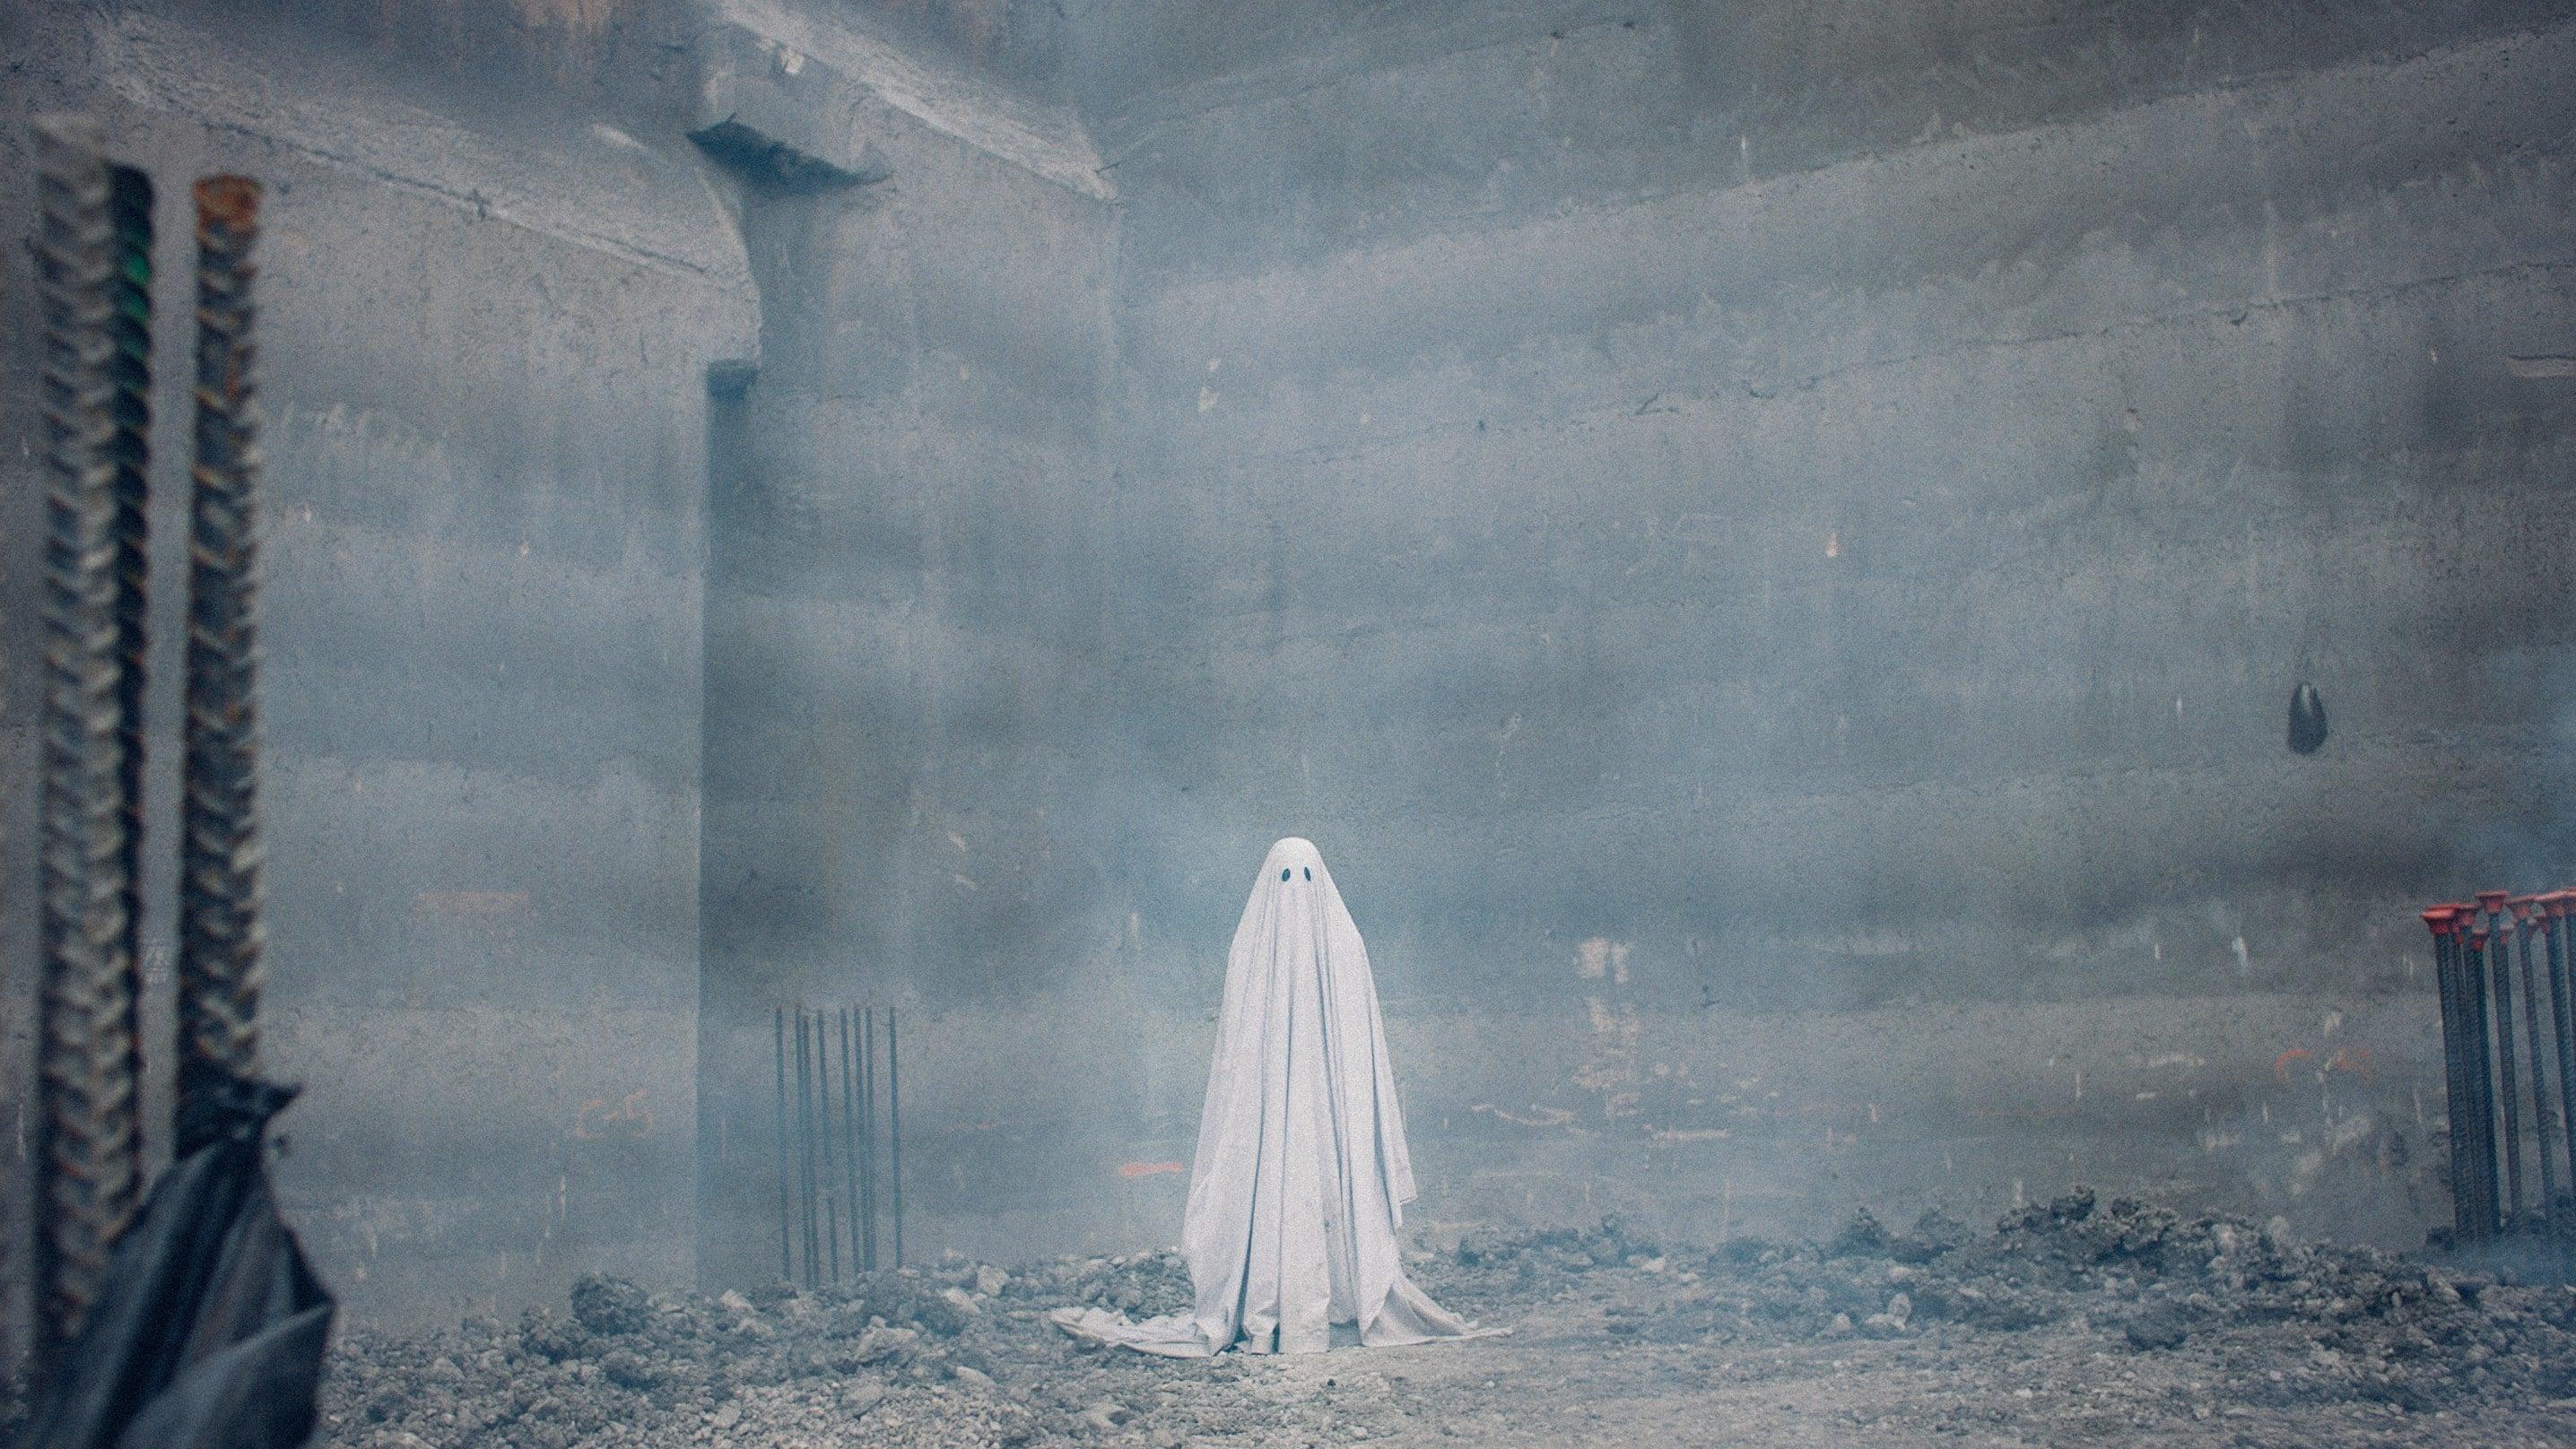 Ver A Ghost Story Película Subtitulada Online Completa Hd Gratis